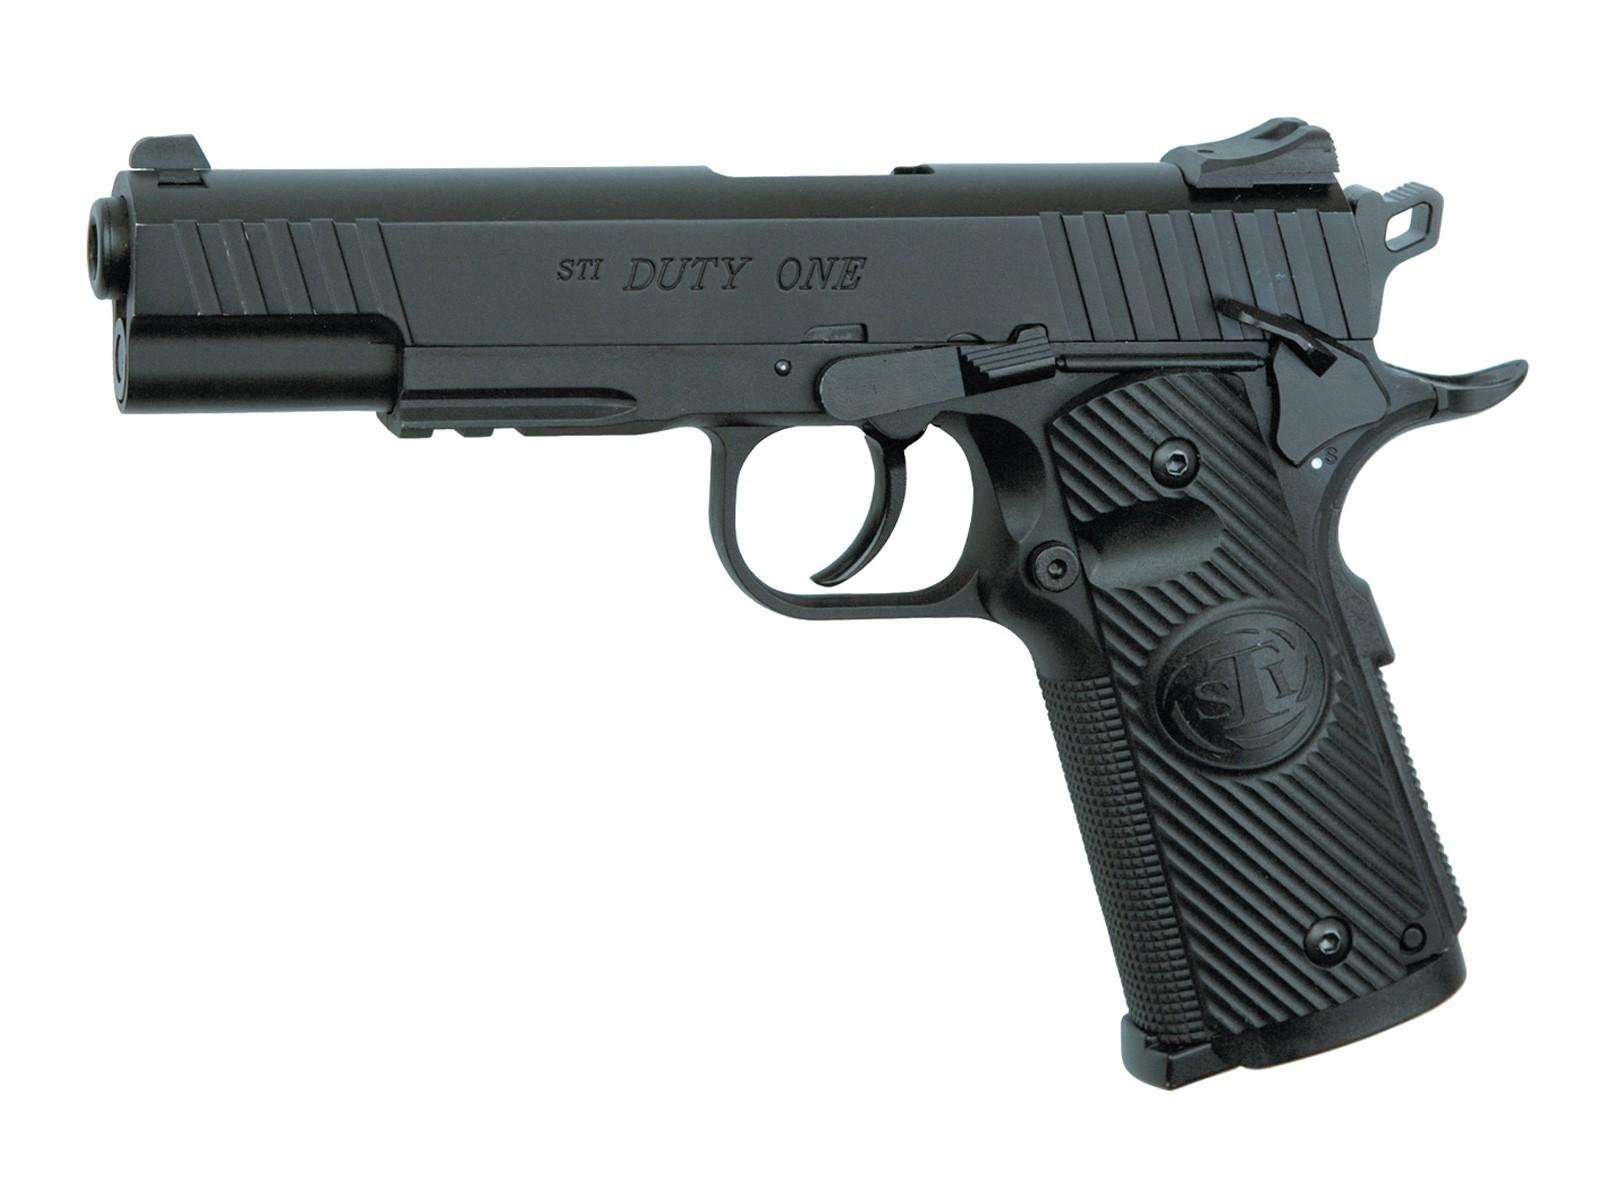 Cheap STI Duty One CO2 BB Pistol 0.177